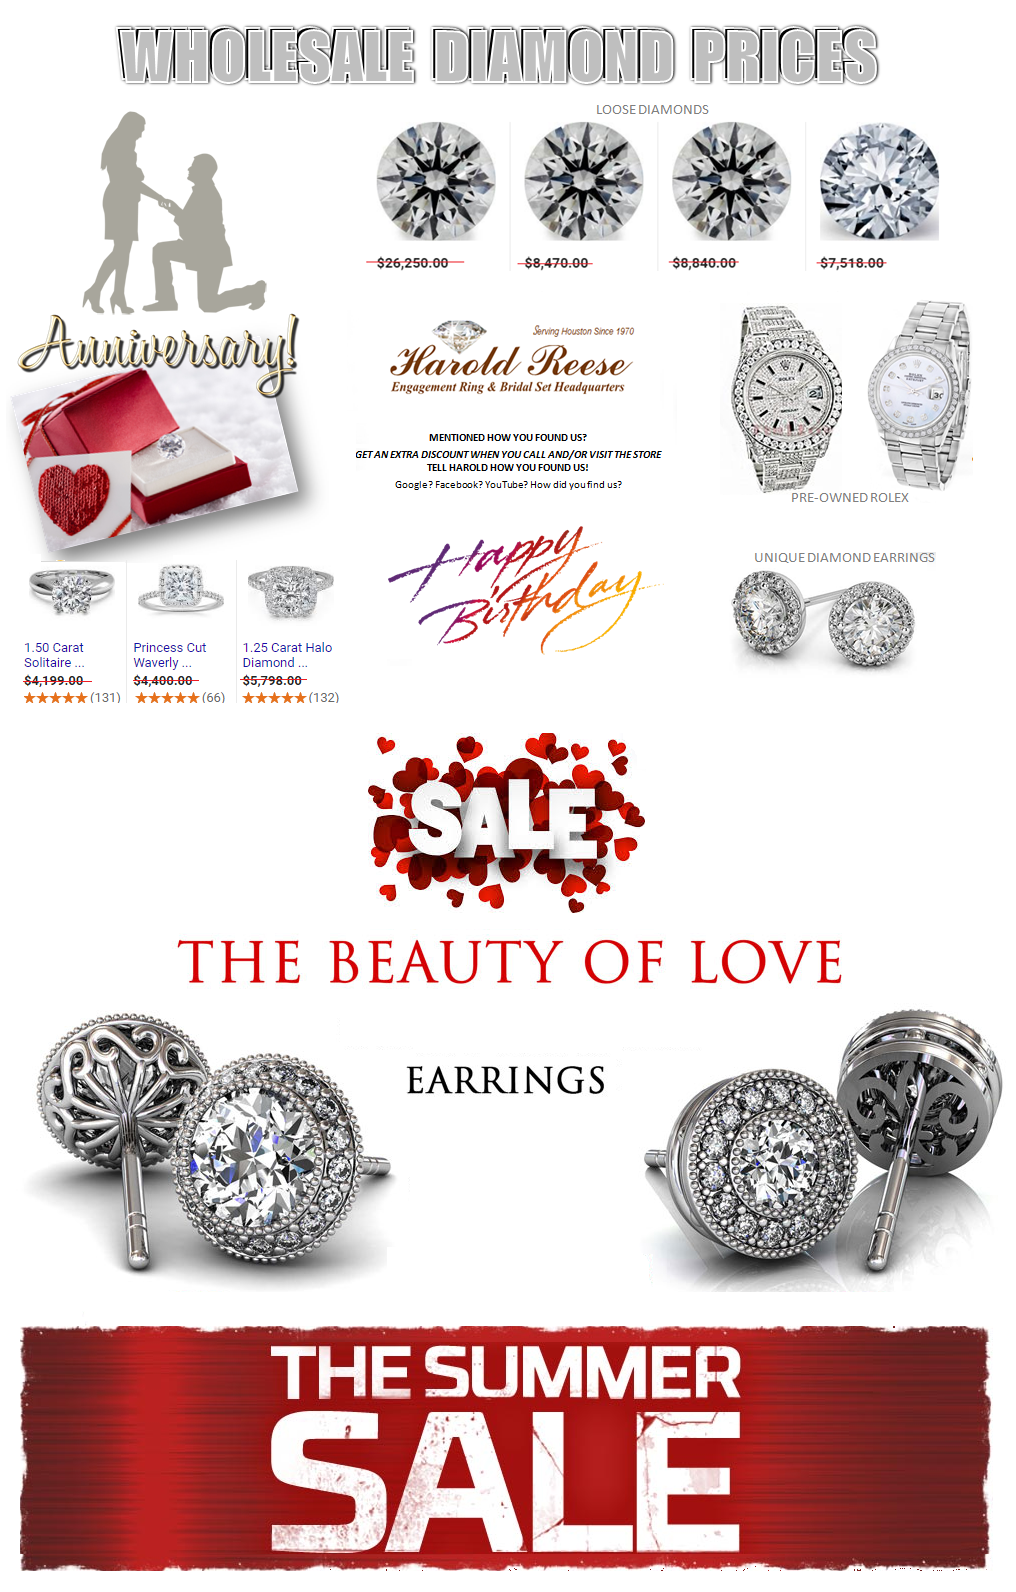 Wholesale Diamond Prices Houston Jewelry Store - MyDiamondMan The Summer Sale